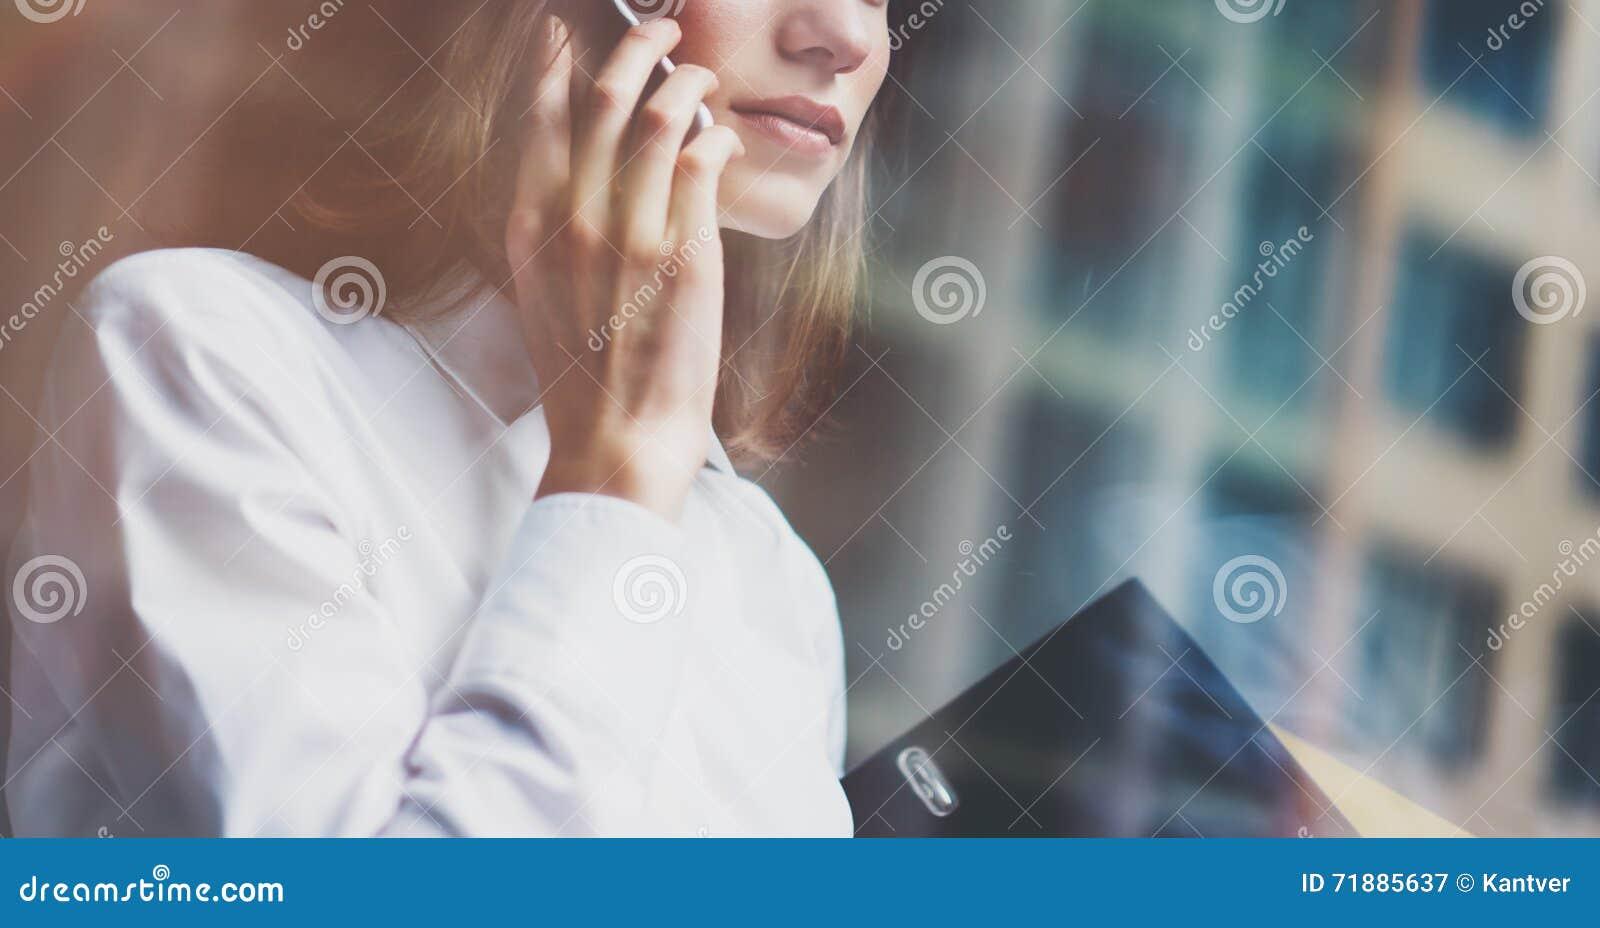 Technology Management Image: Photo Business Woman Wearing Modern Suit, Talking